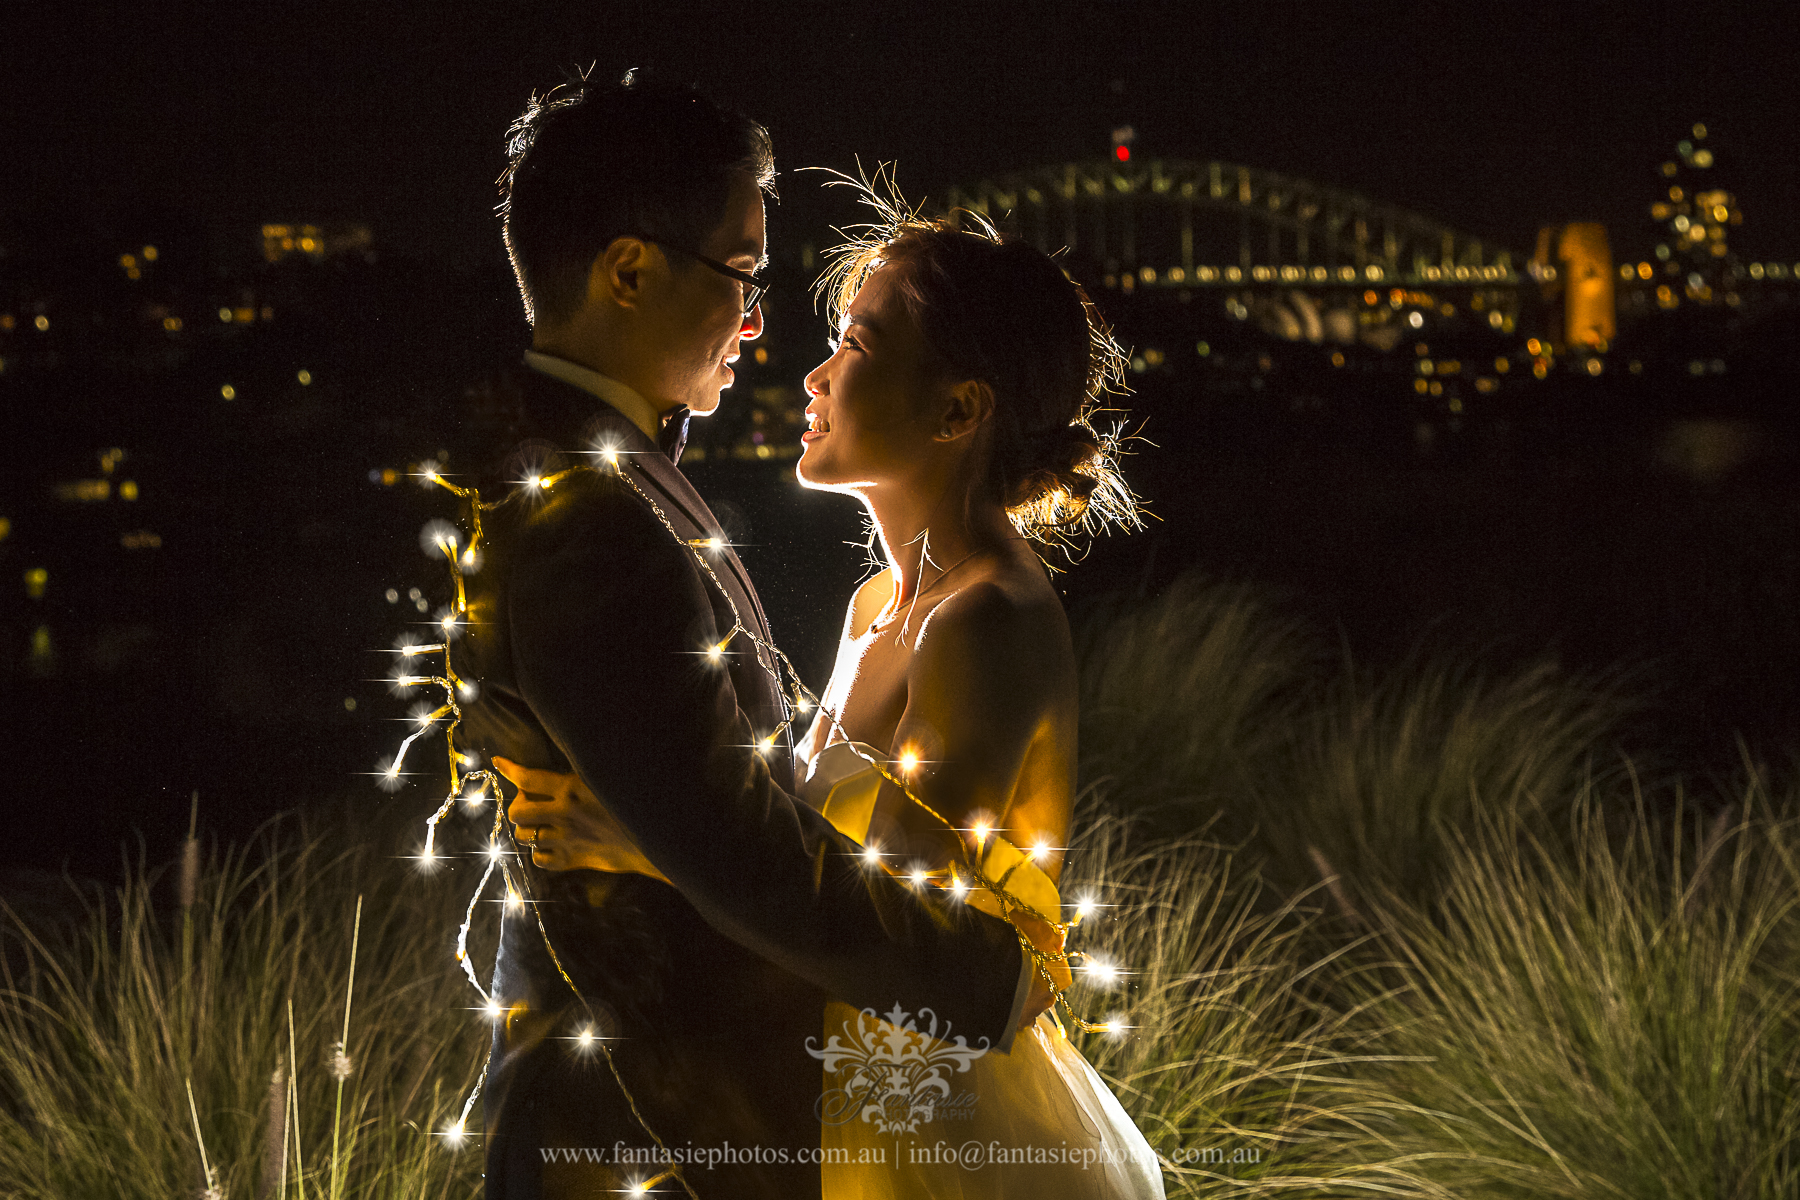 Wedding Photography north sydney | Fantasie Photography